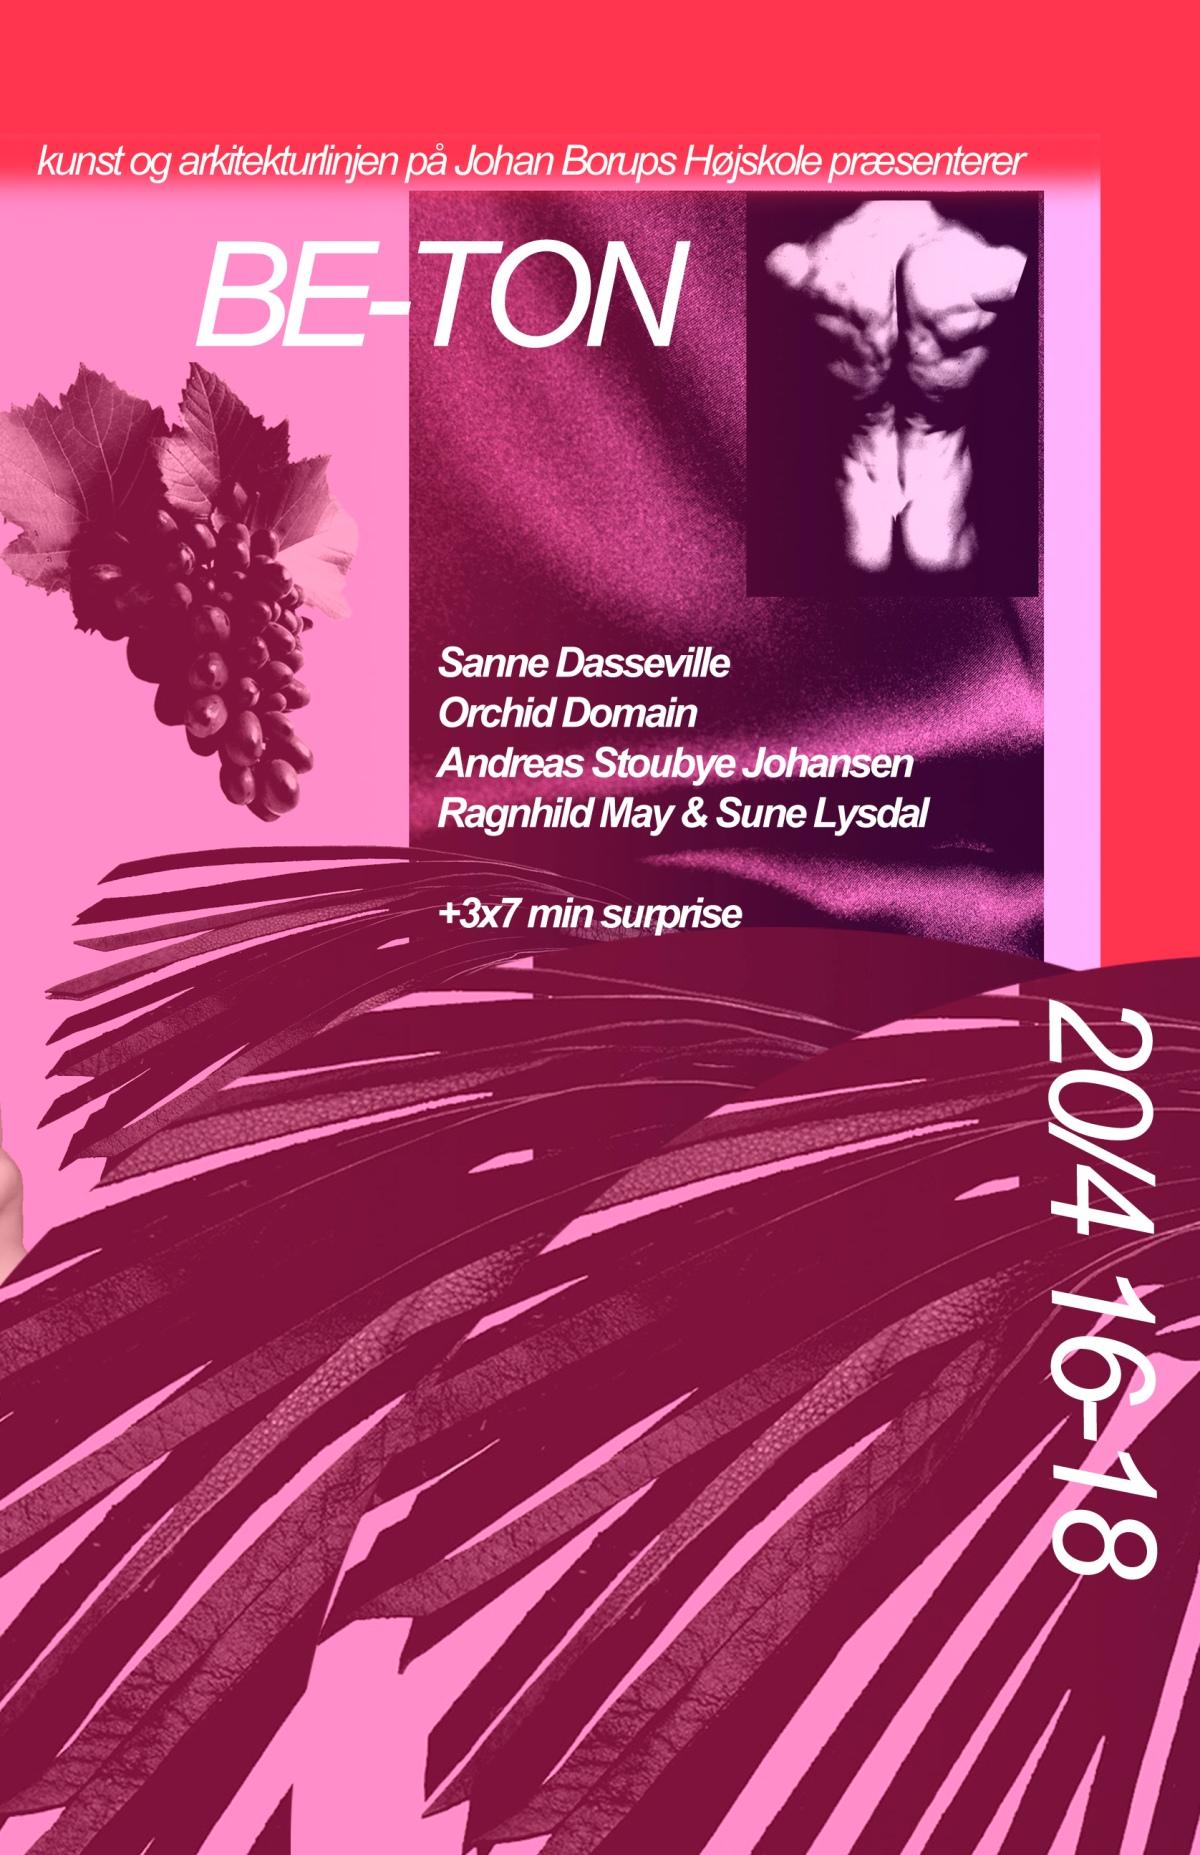 BE-TON Lyd & Kunstkoncert